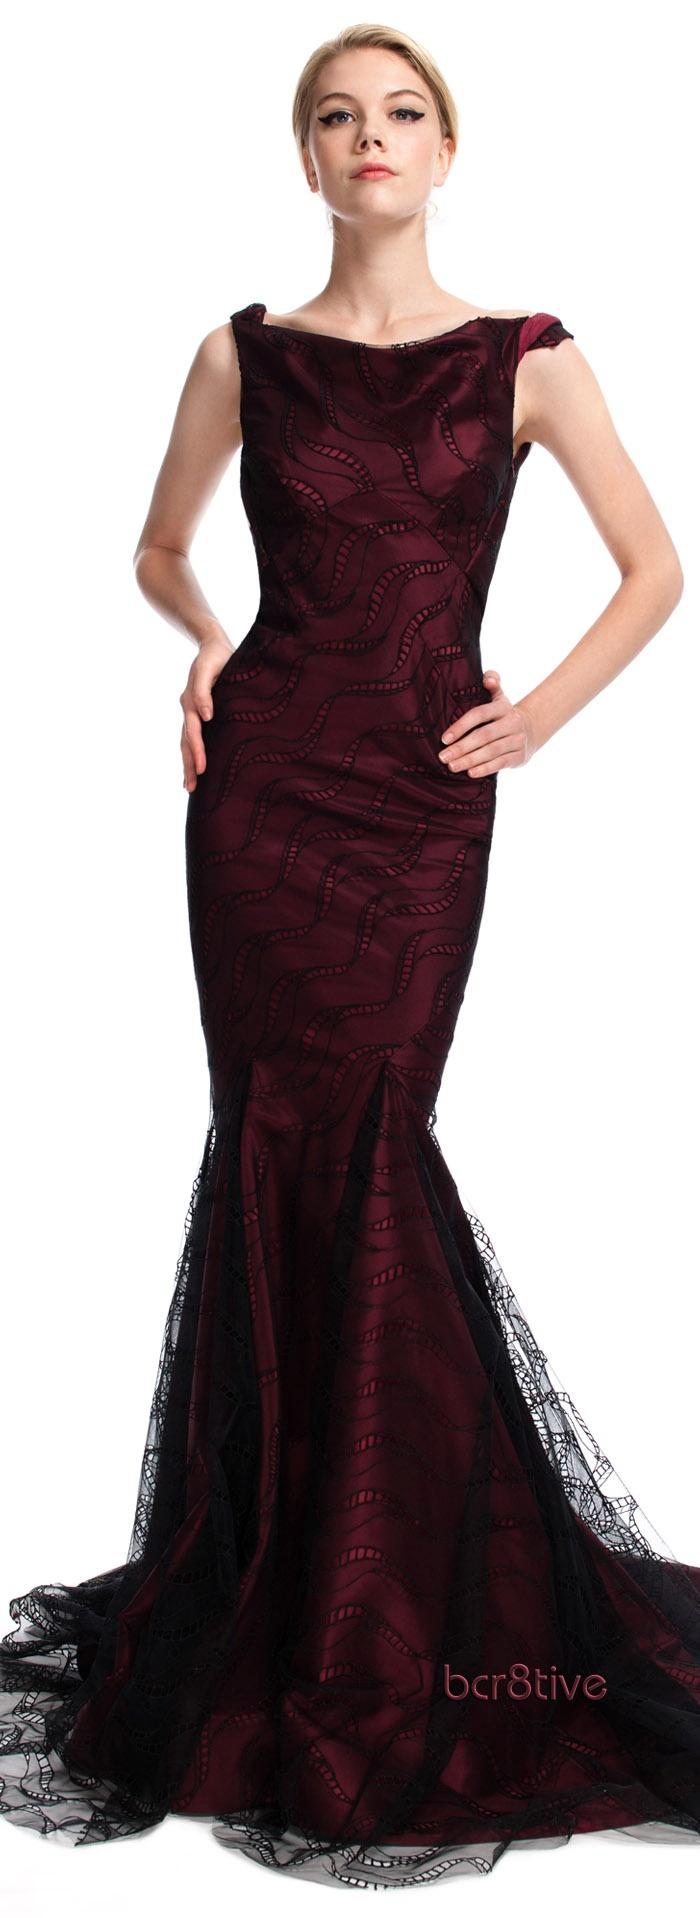 #Zac Posen Bateau Neck Mermaid Evening Gown Pre-Fall RTW 2013